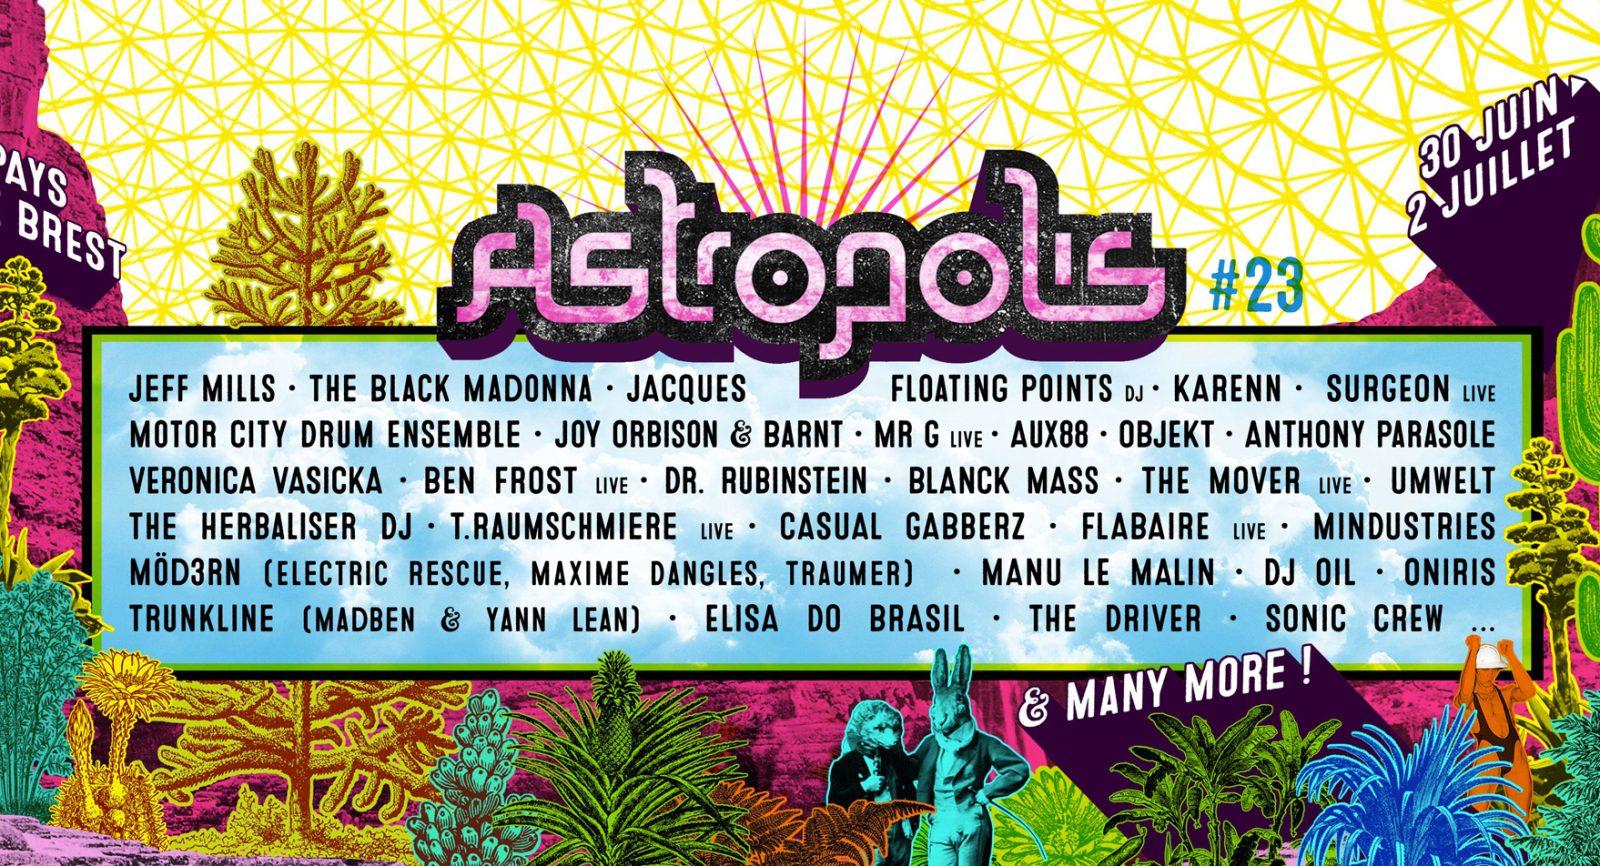 [Festival] Programmation Astropolis 2017